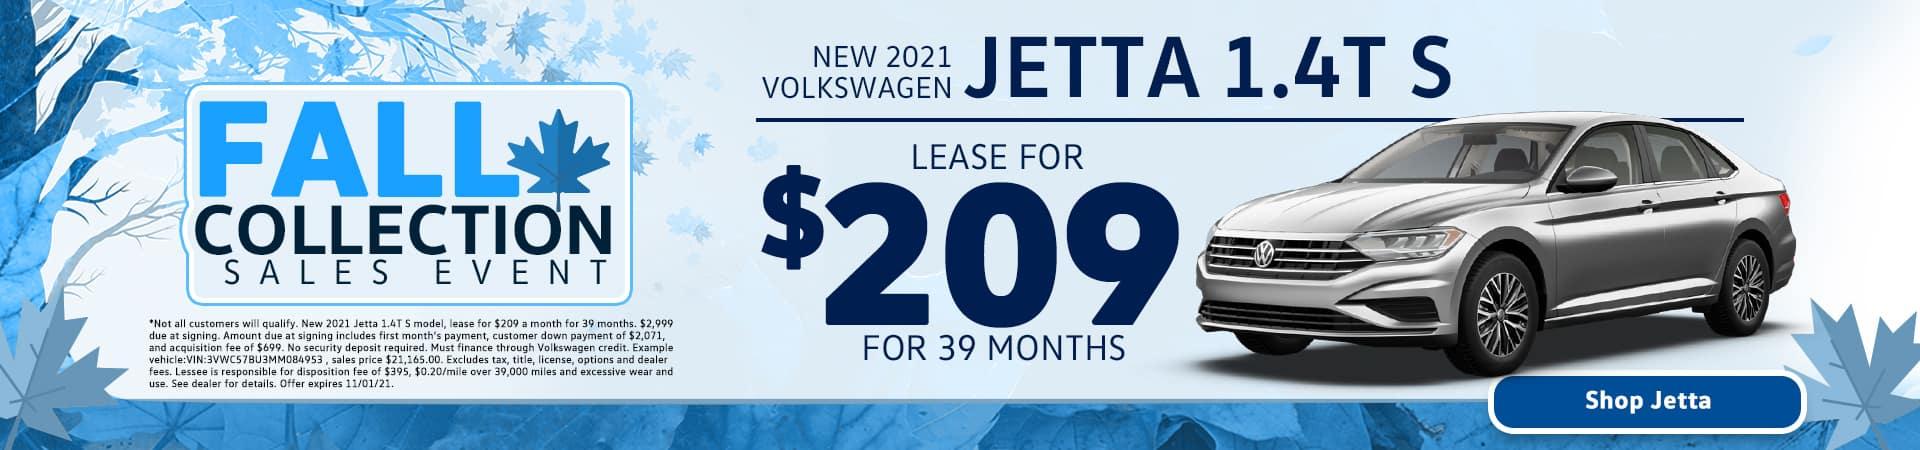 New 2021 Volkswagen Jetta 1.4T S for Sale in Tampa, FL